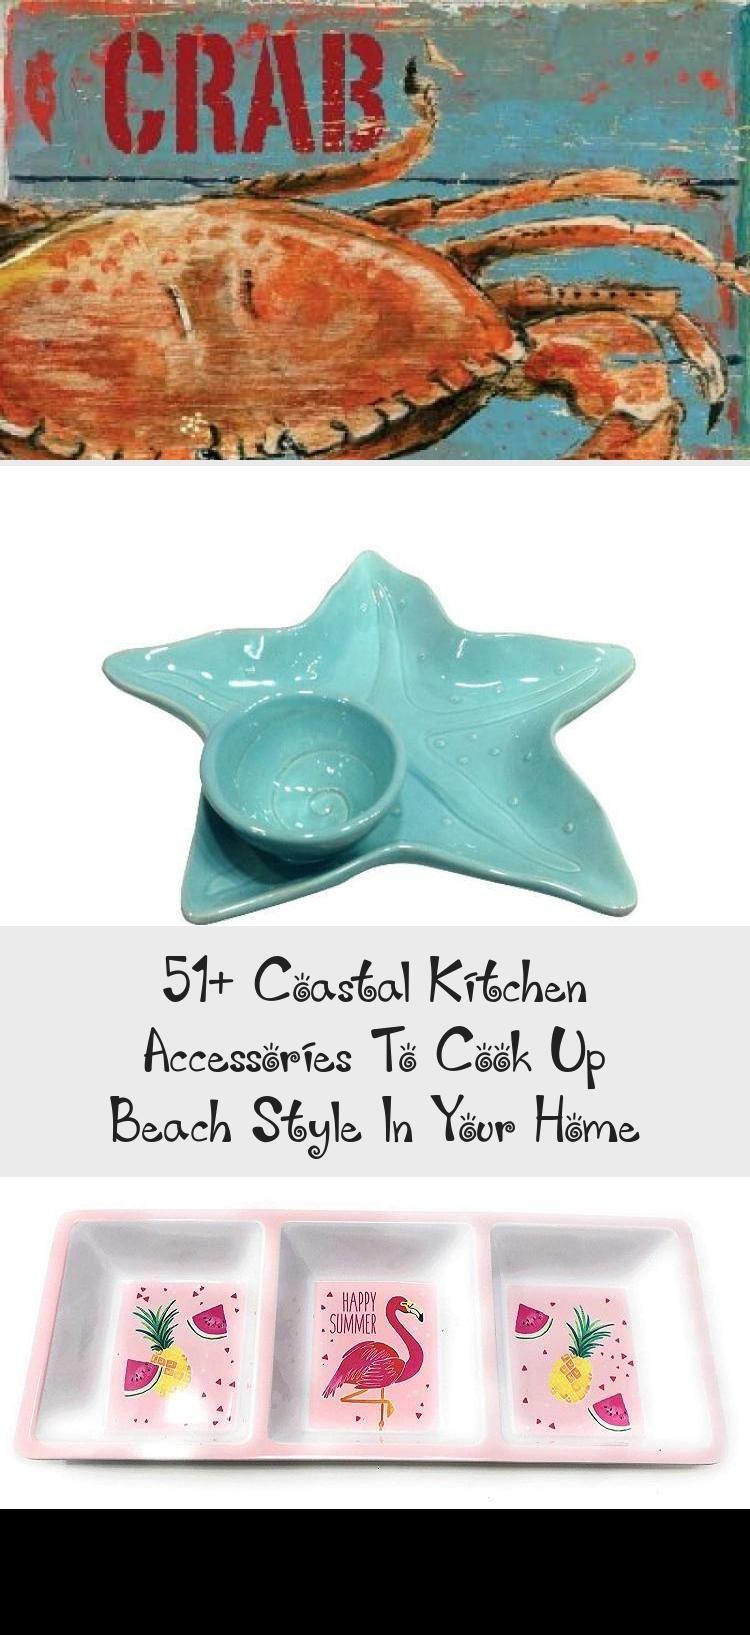 51+ Coastal Kitchen Accessories To Cook Up Beach Style In Your Home – KTCHN Kitchen